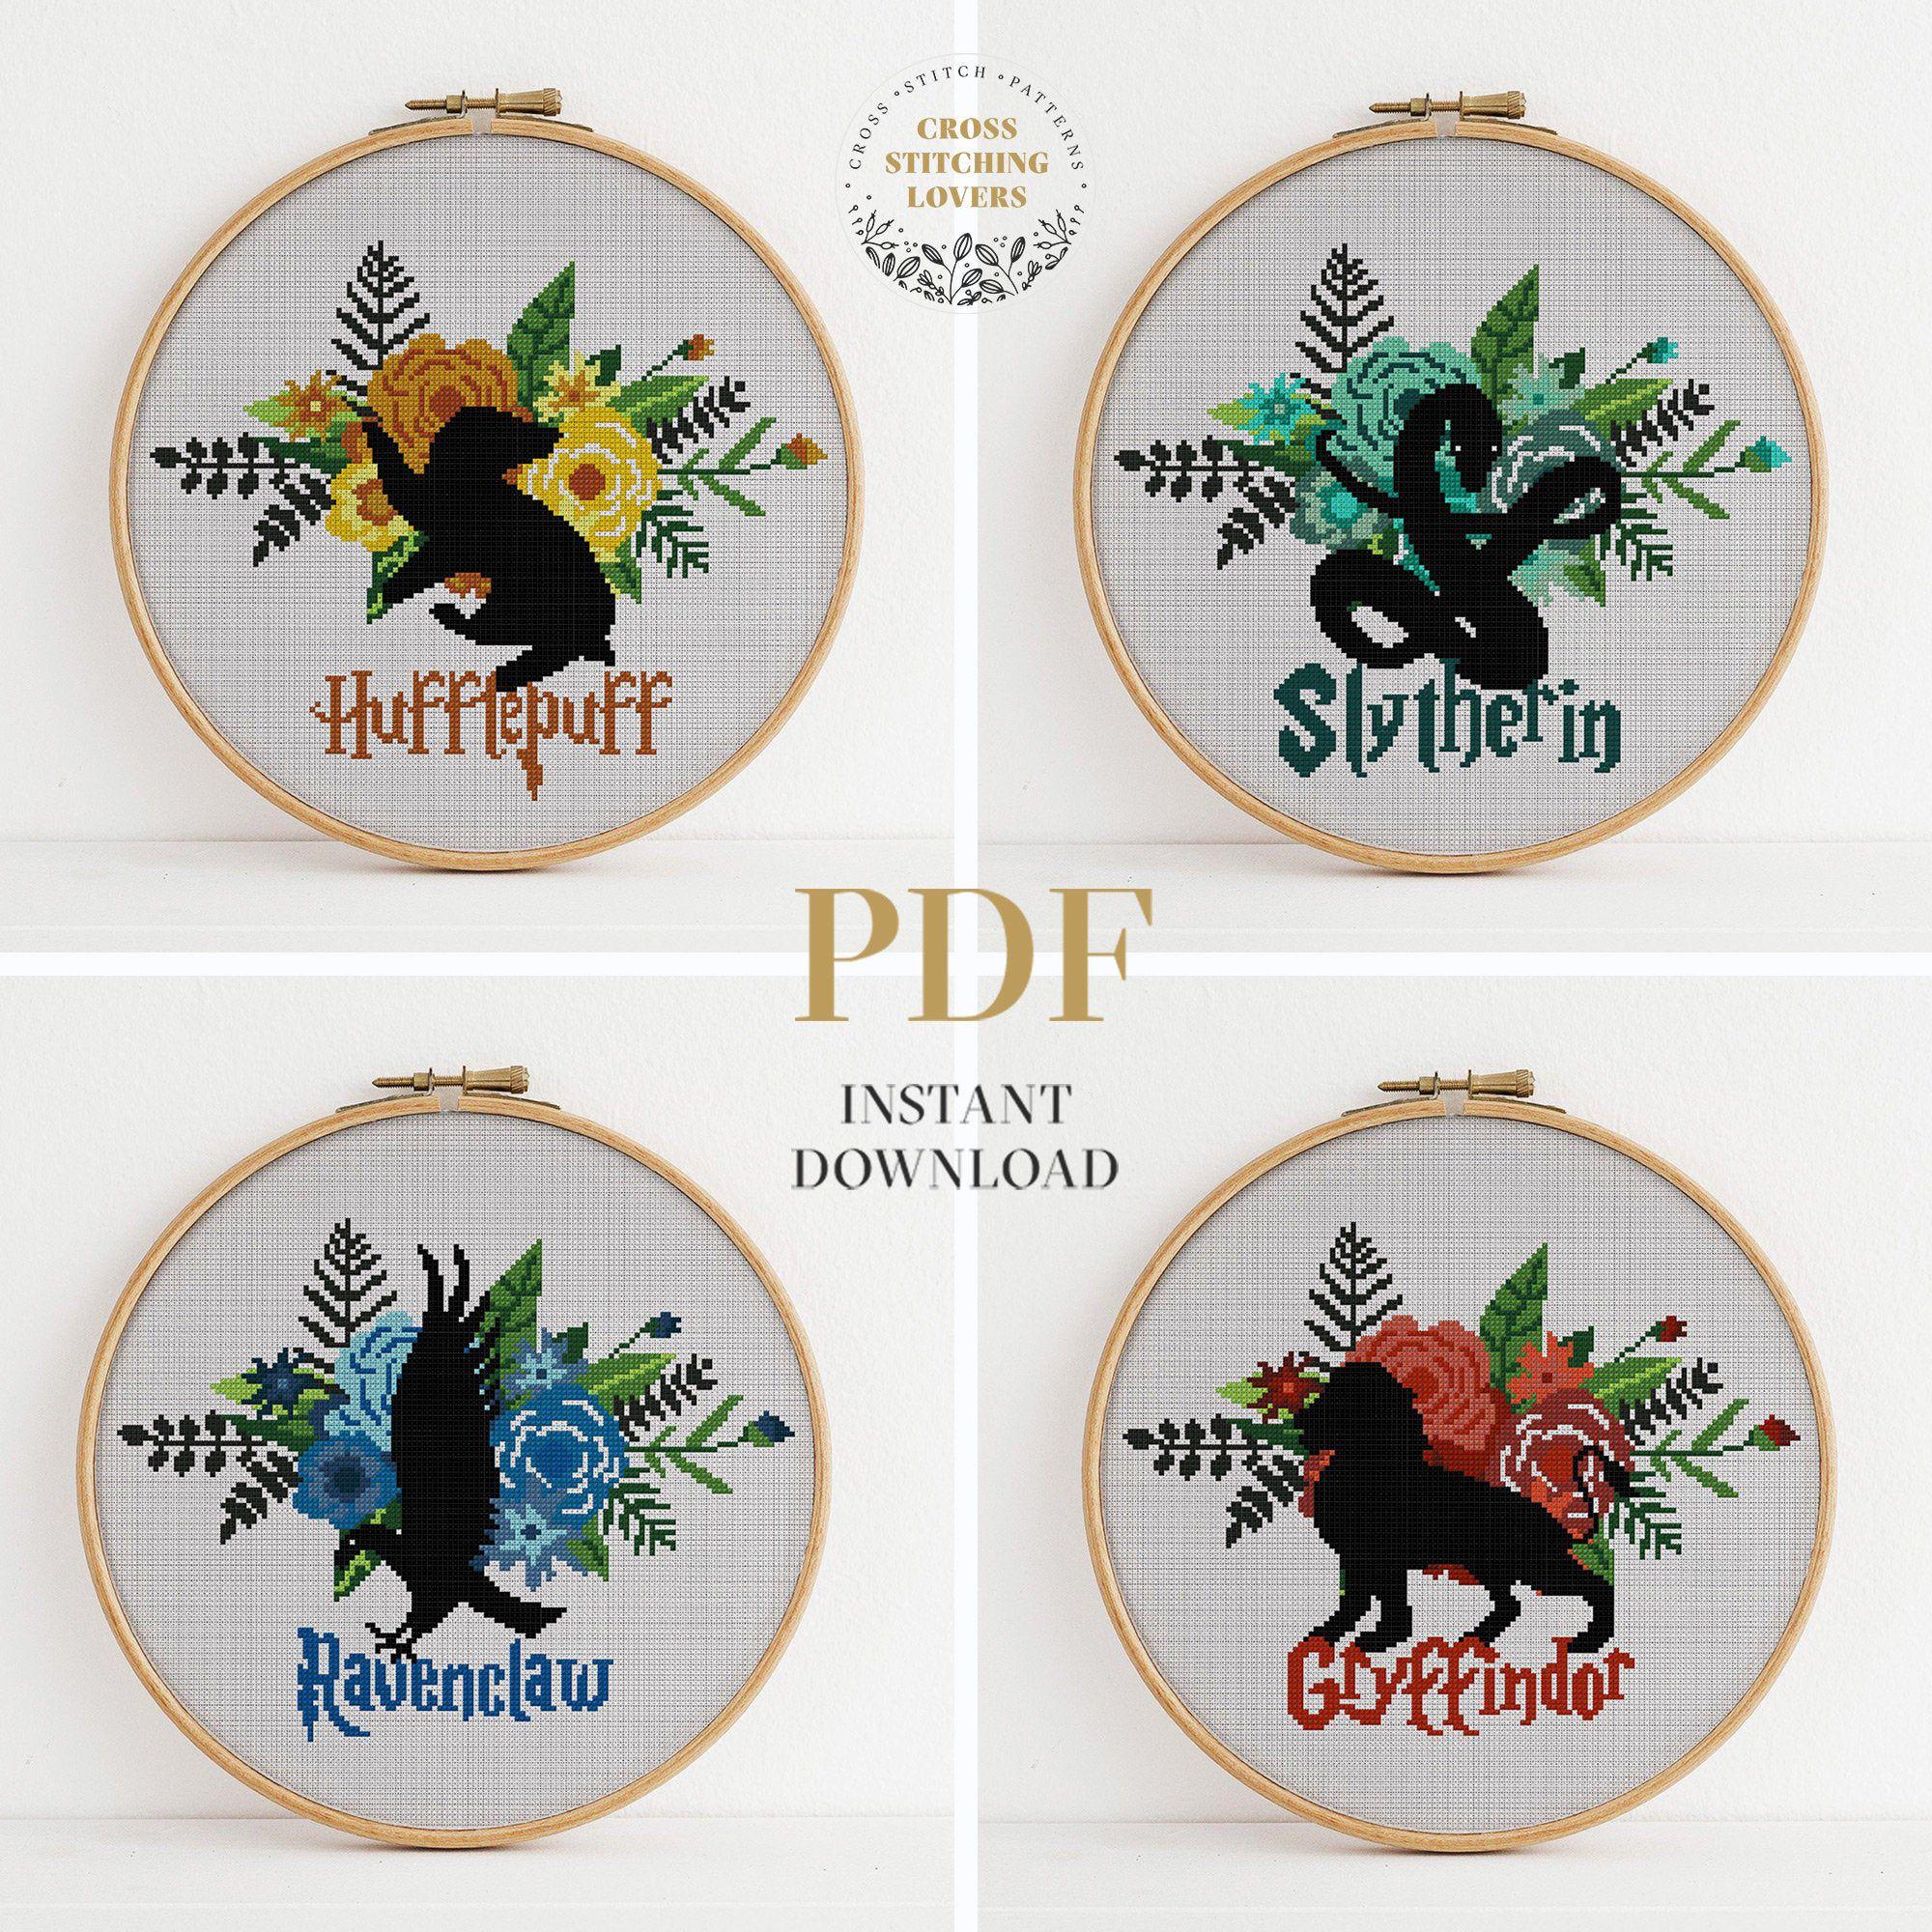 Photo of House crest Cross stitch pattern, HP fan art, PDF Instant Download, cross-stitch bundle, embroidery pattern, personal gift idea